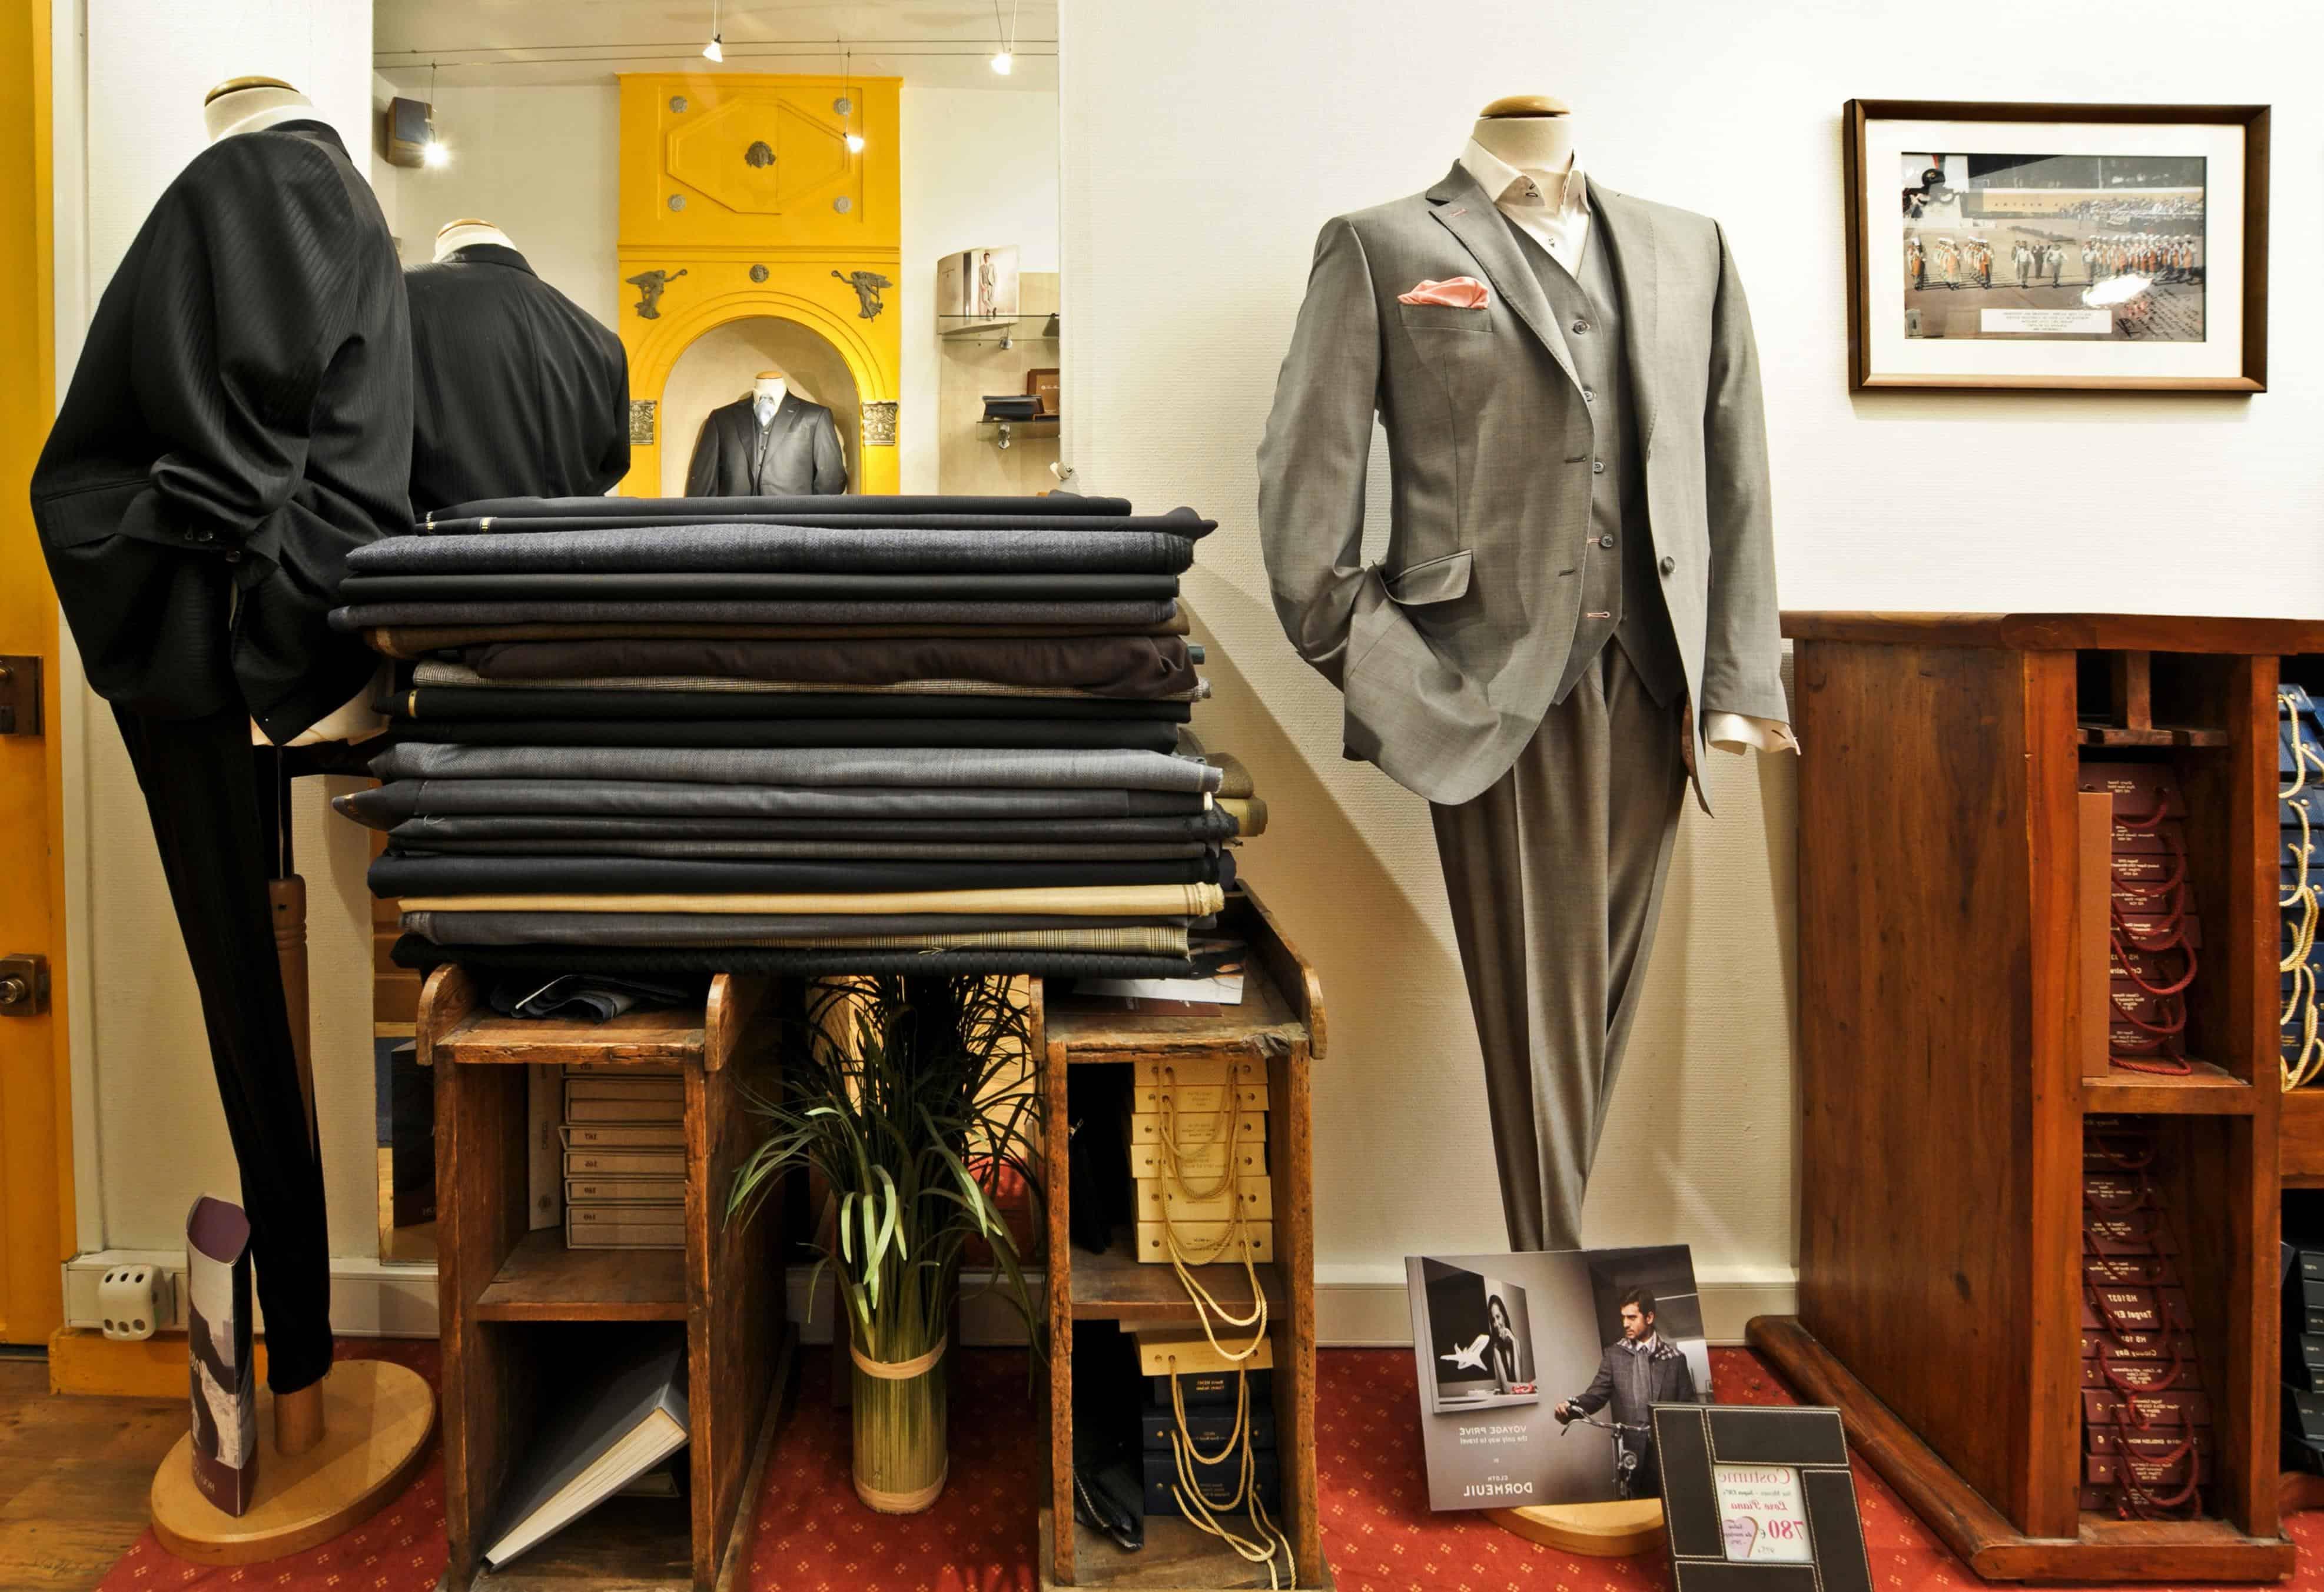 Free picture: furniture, fashion, art, jacket, trousers, tailor, table, elegant